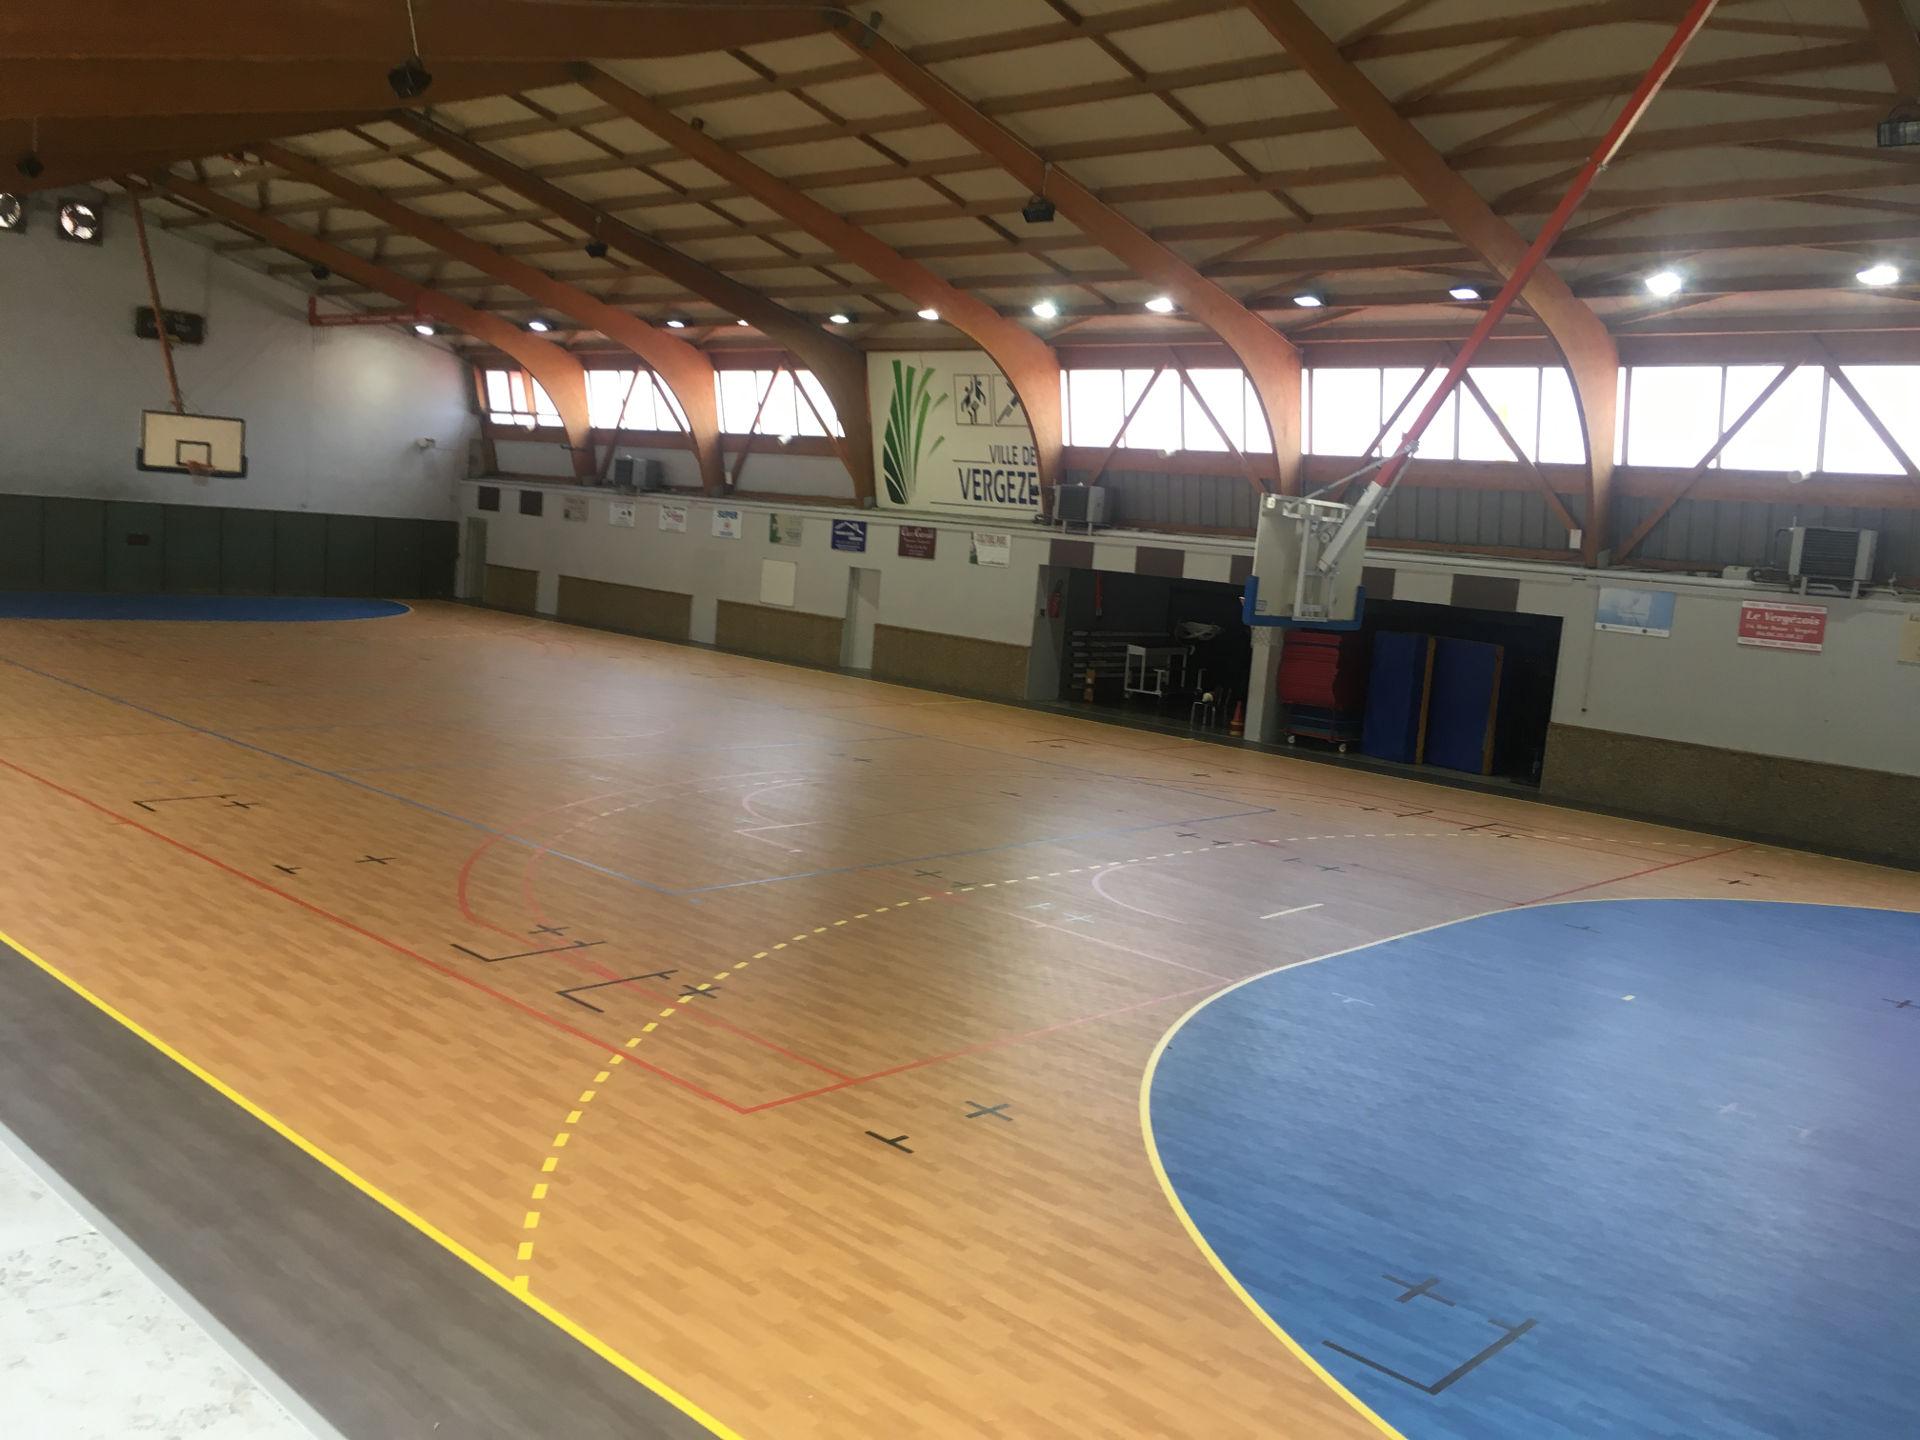 terrain multisport salle Municipale Vergeze